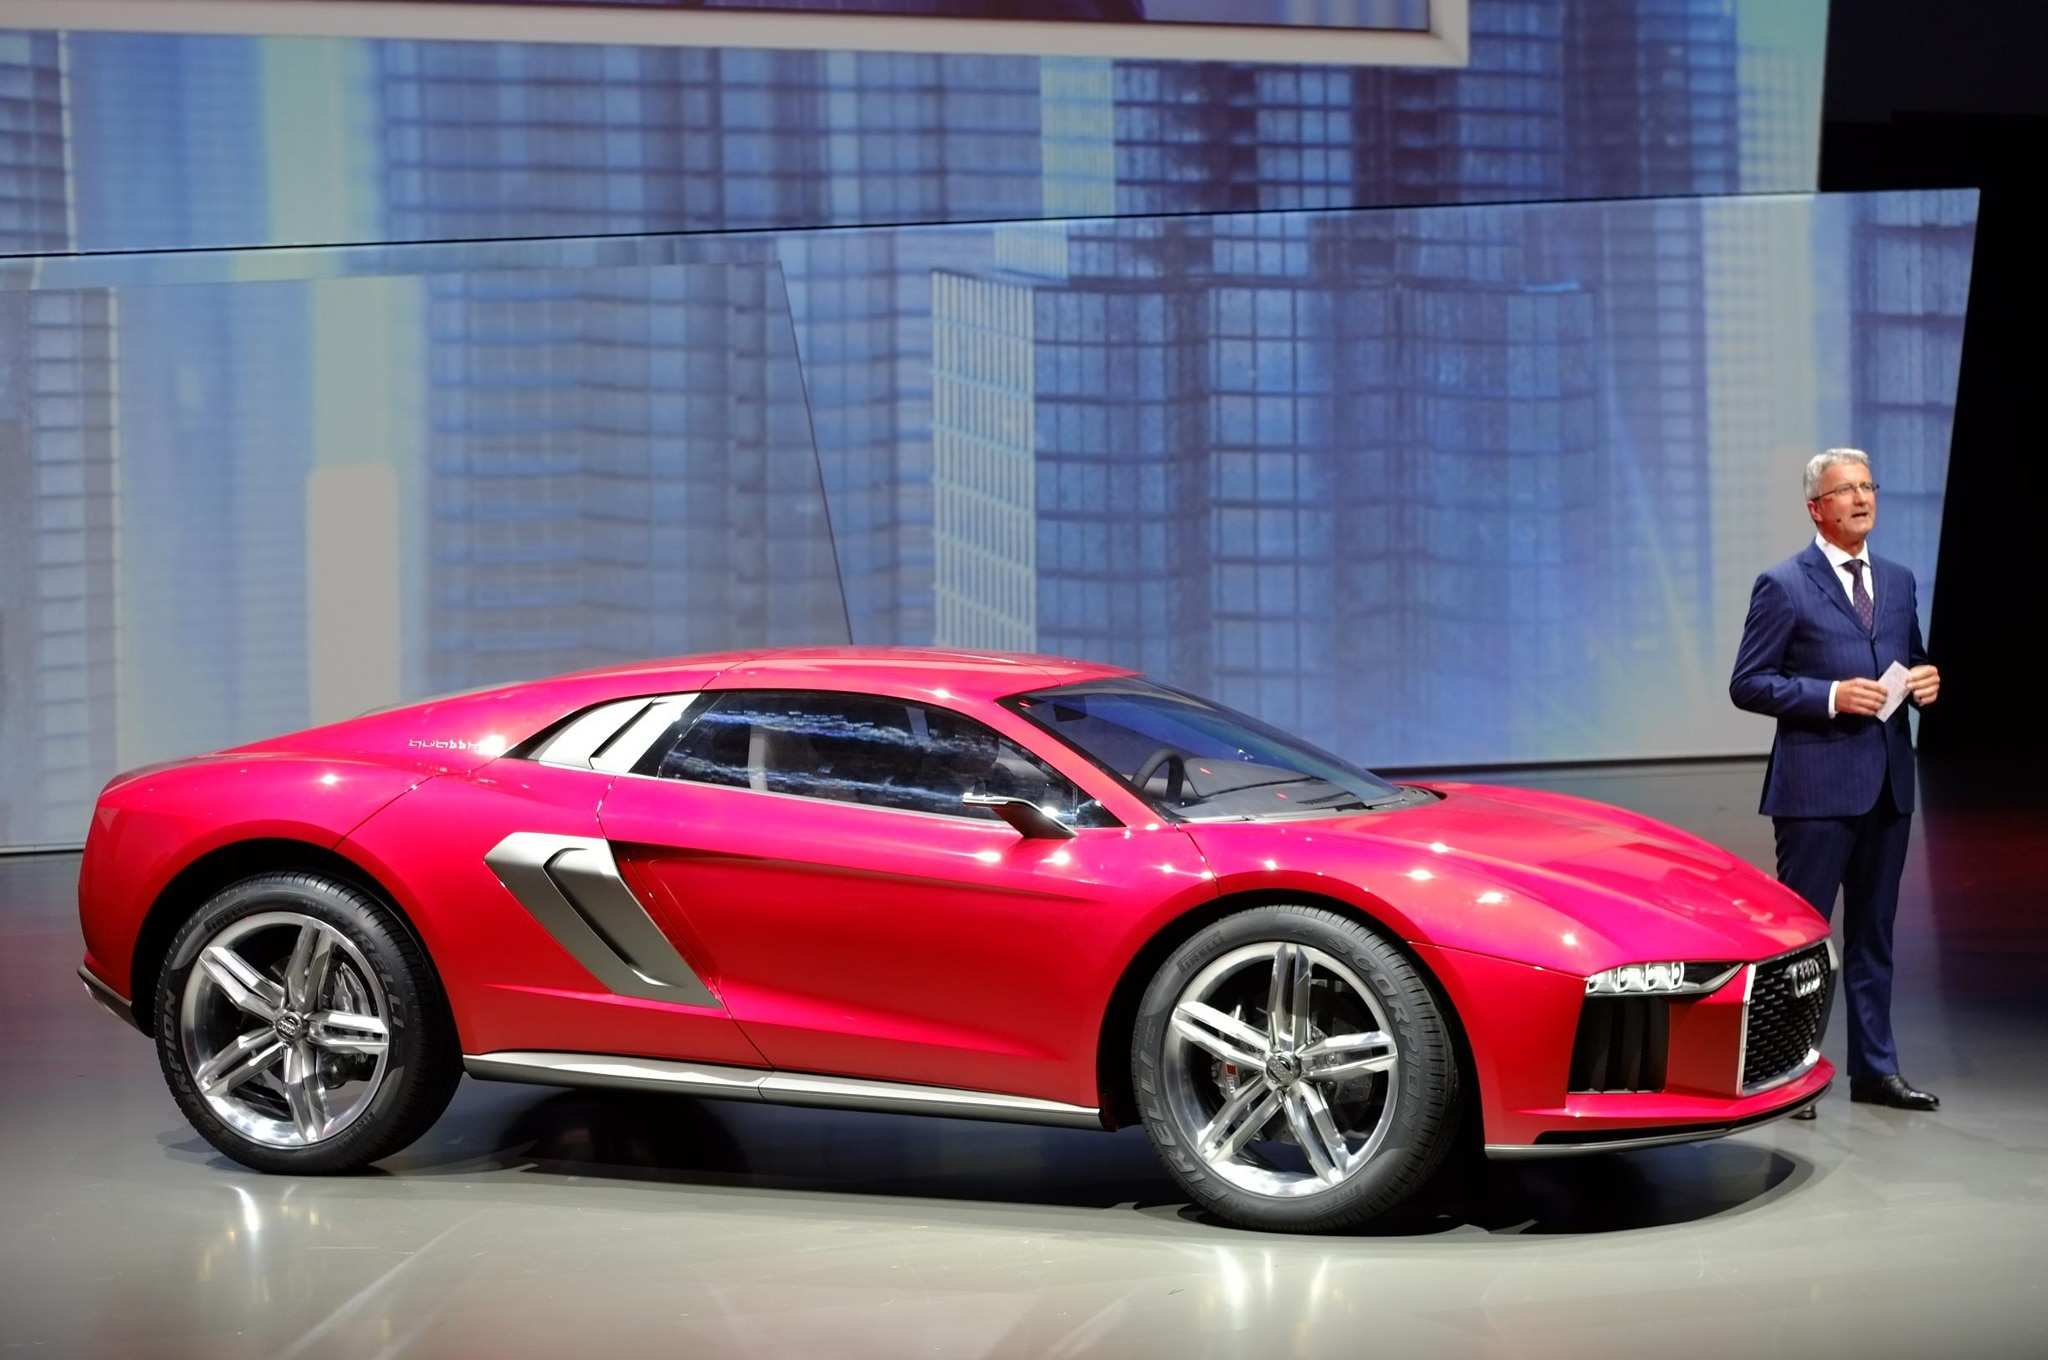 14 Great Audi New Models 2020 Concept for Audi New Models 2020